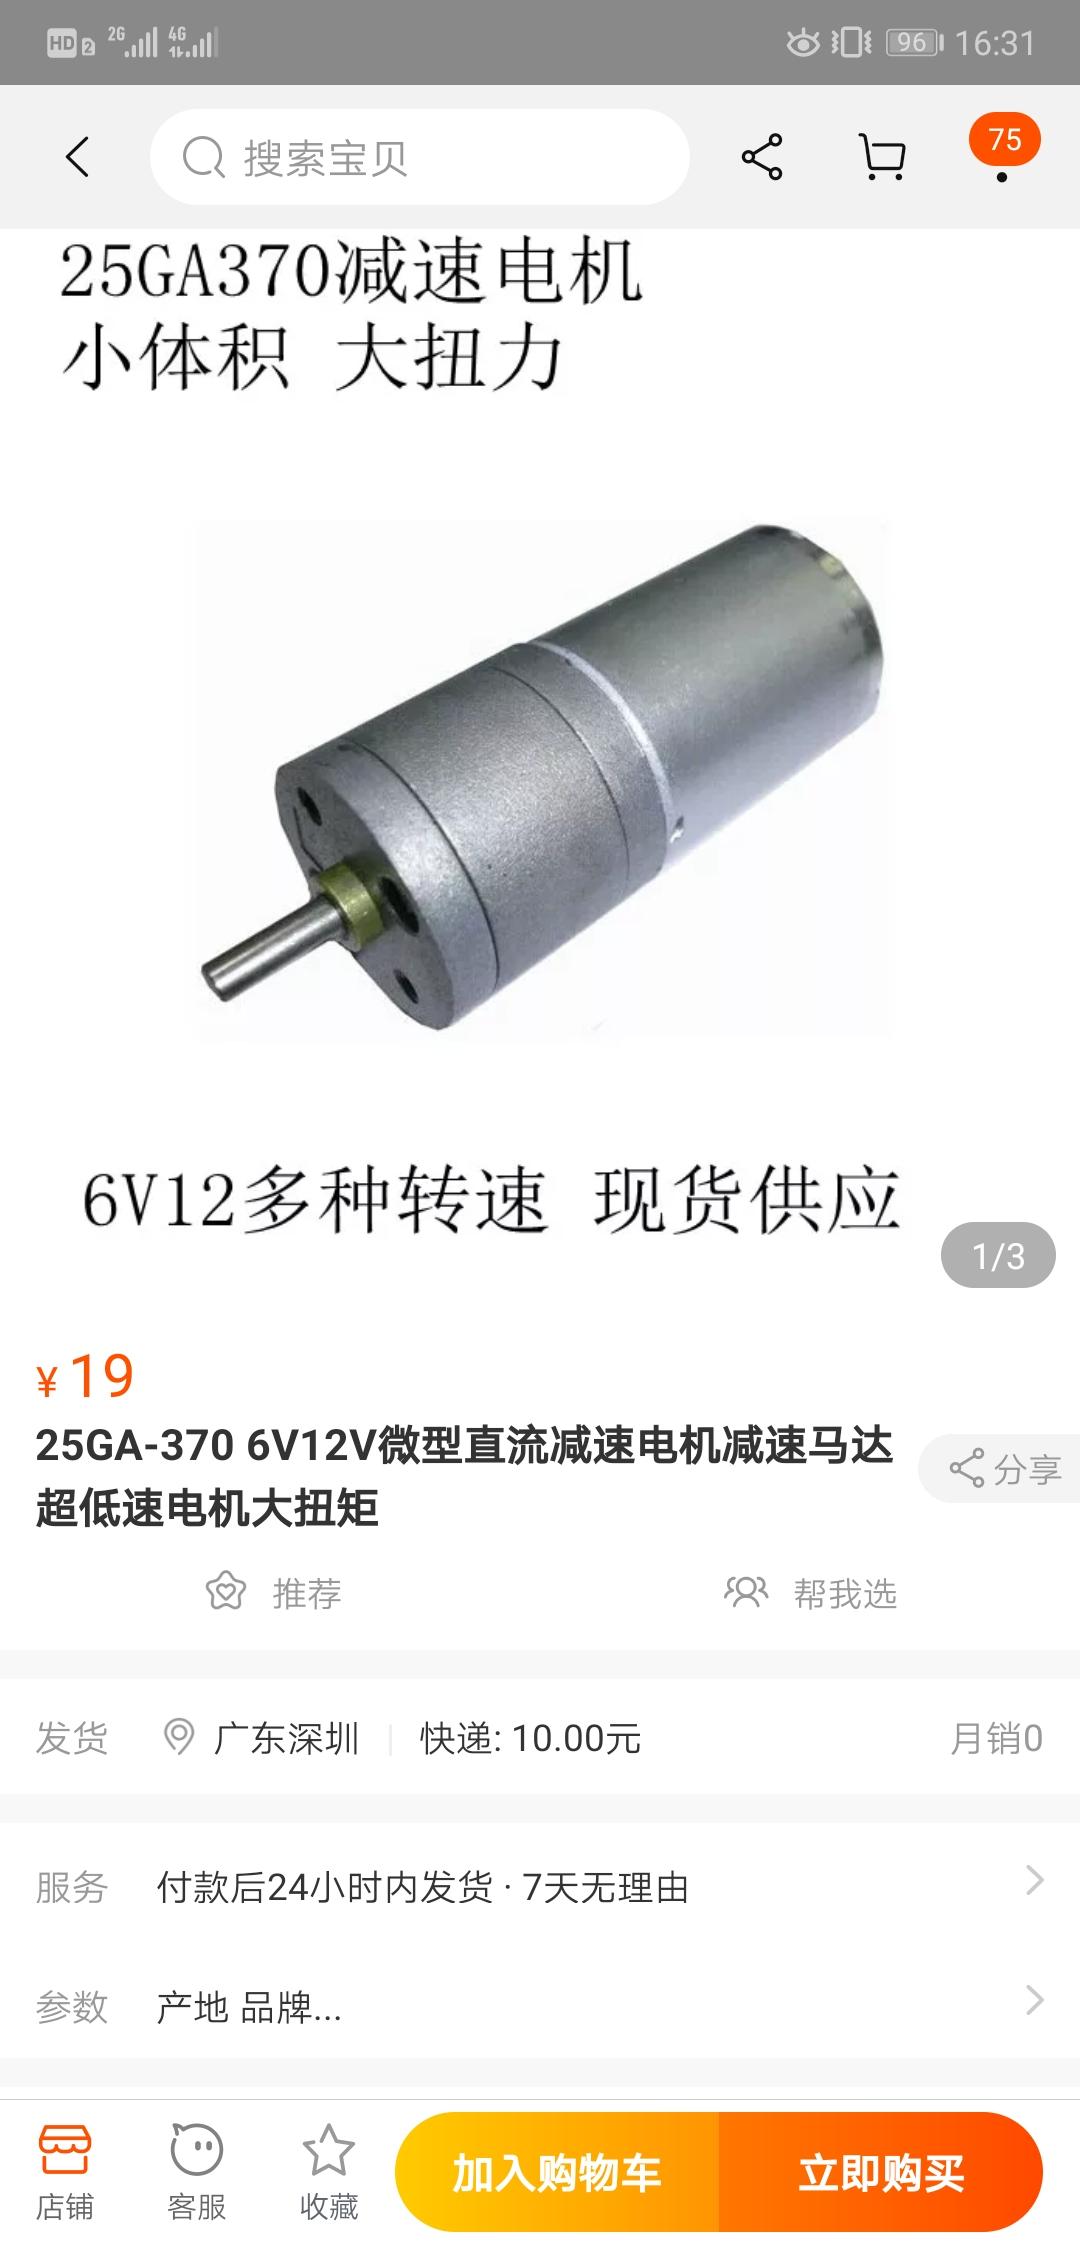 Screenshot_20191102_163147_com.taobao.taobao.jpg